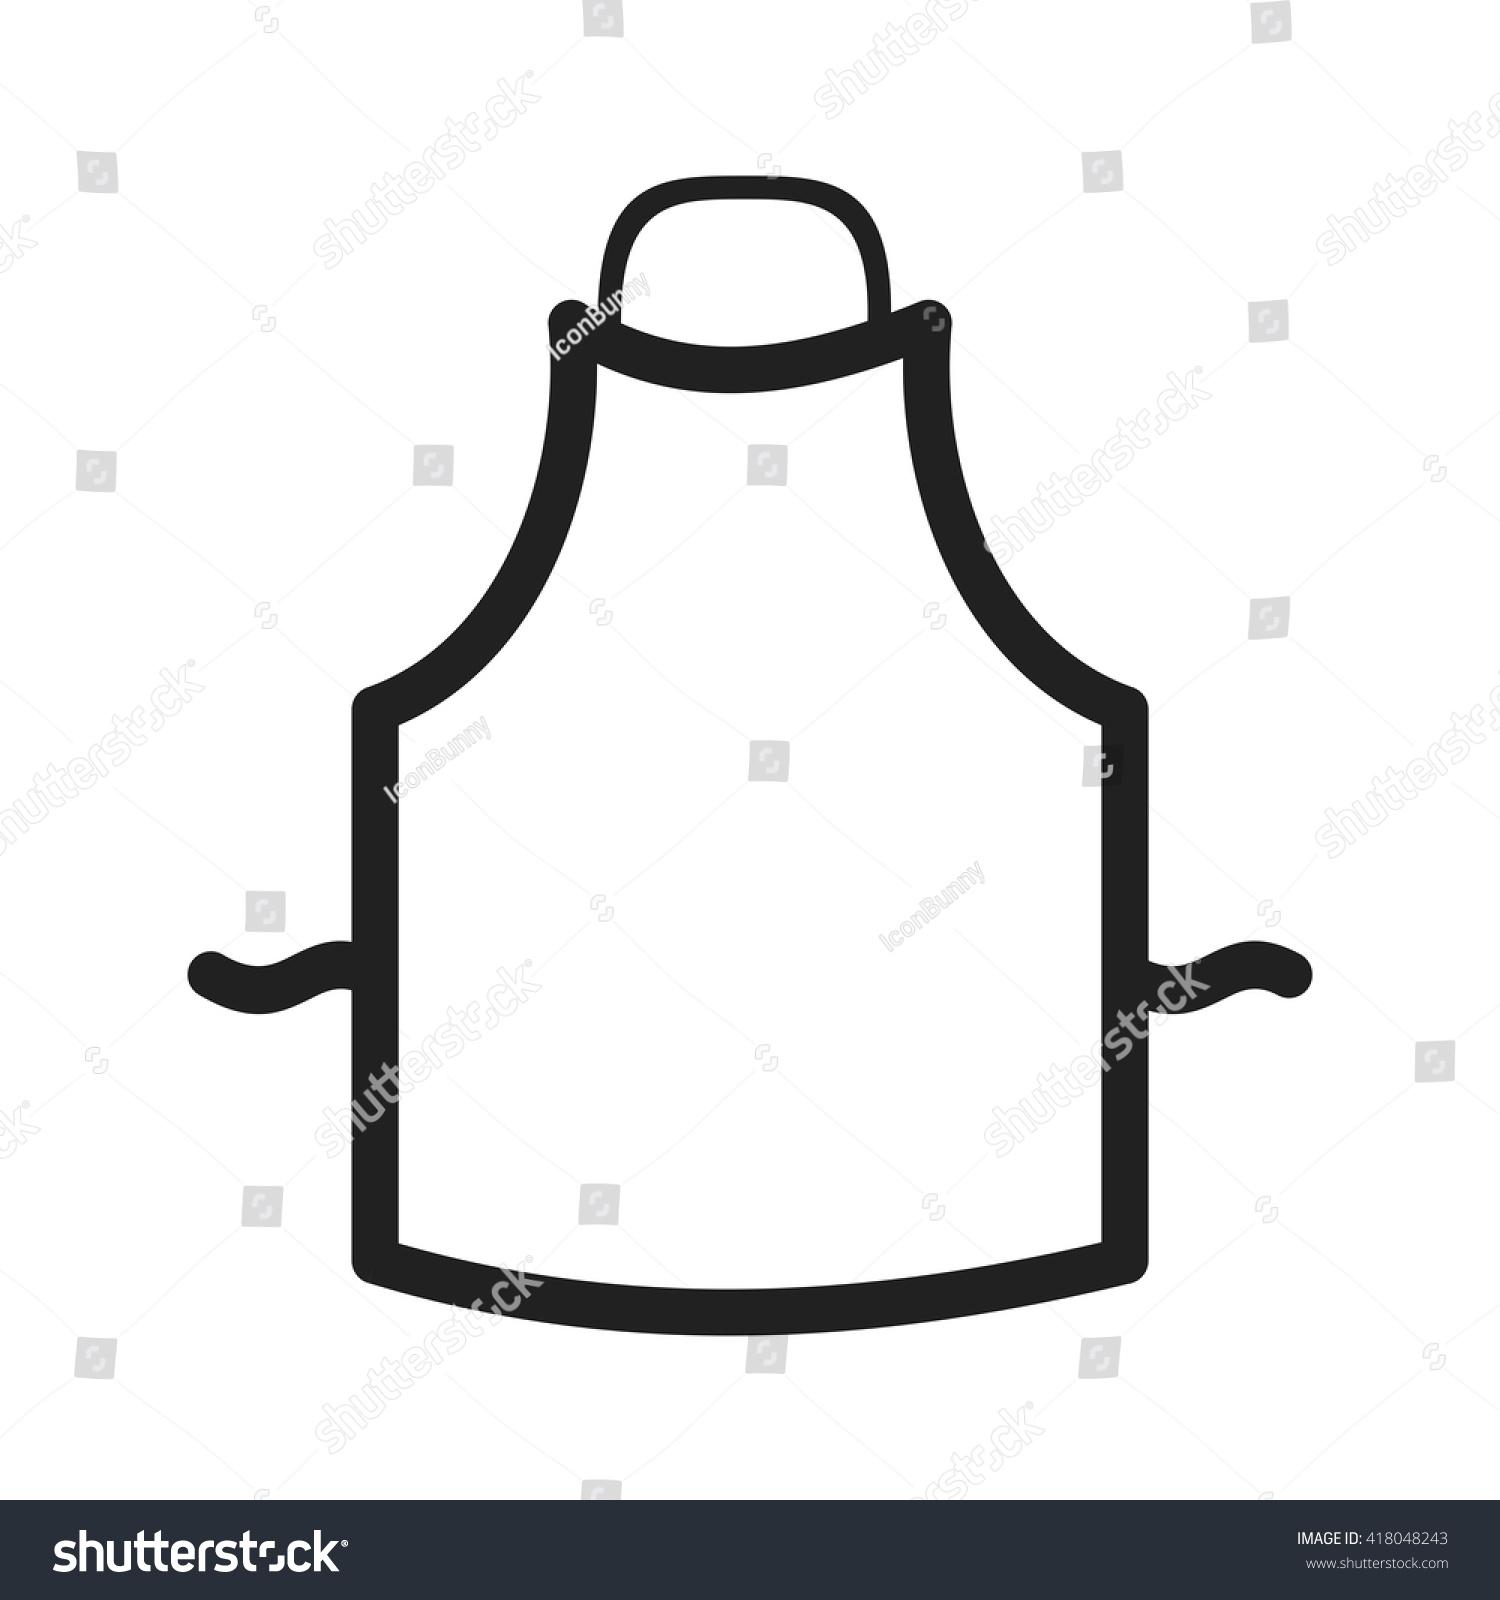 White apron clipart - Apron